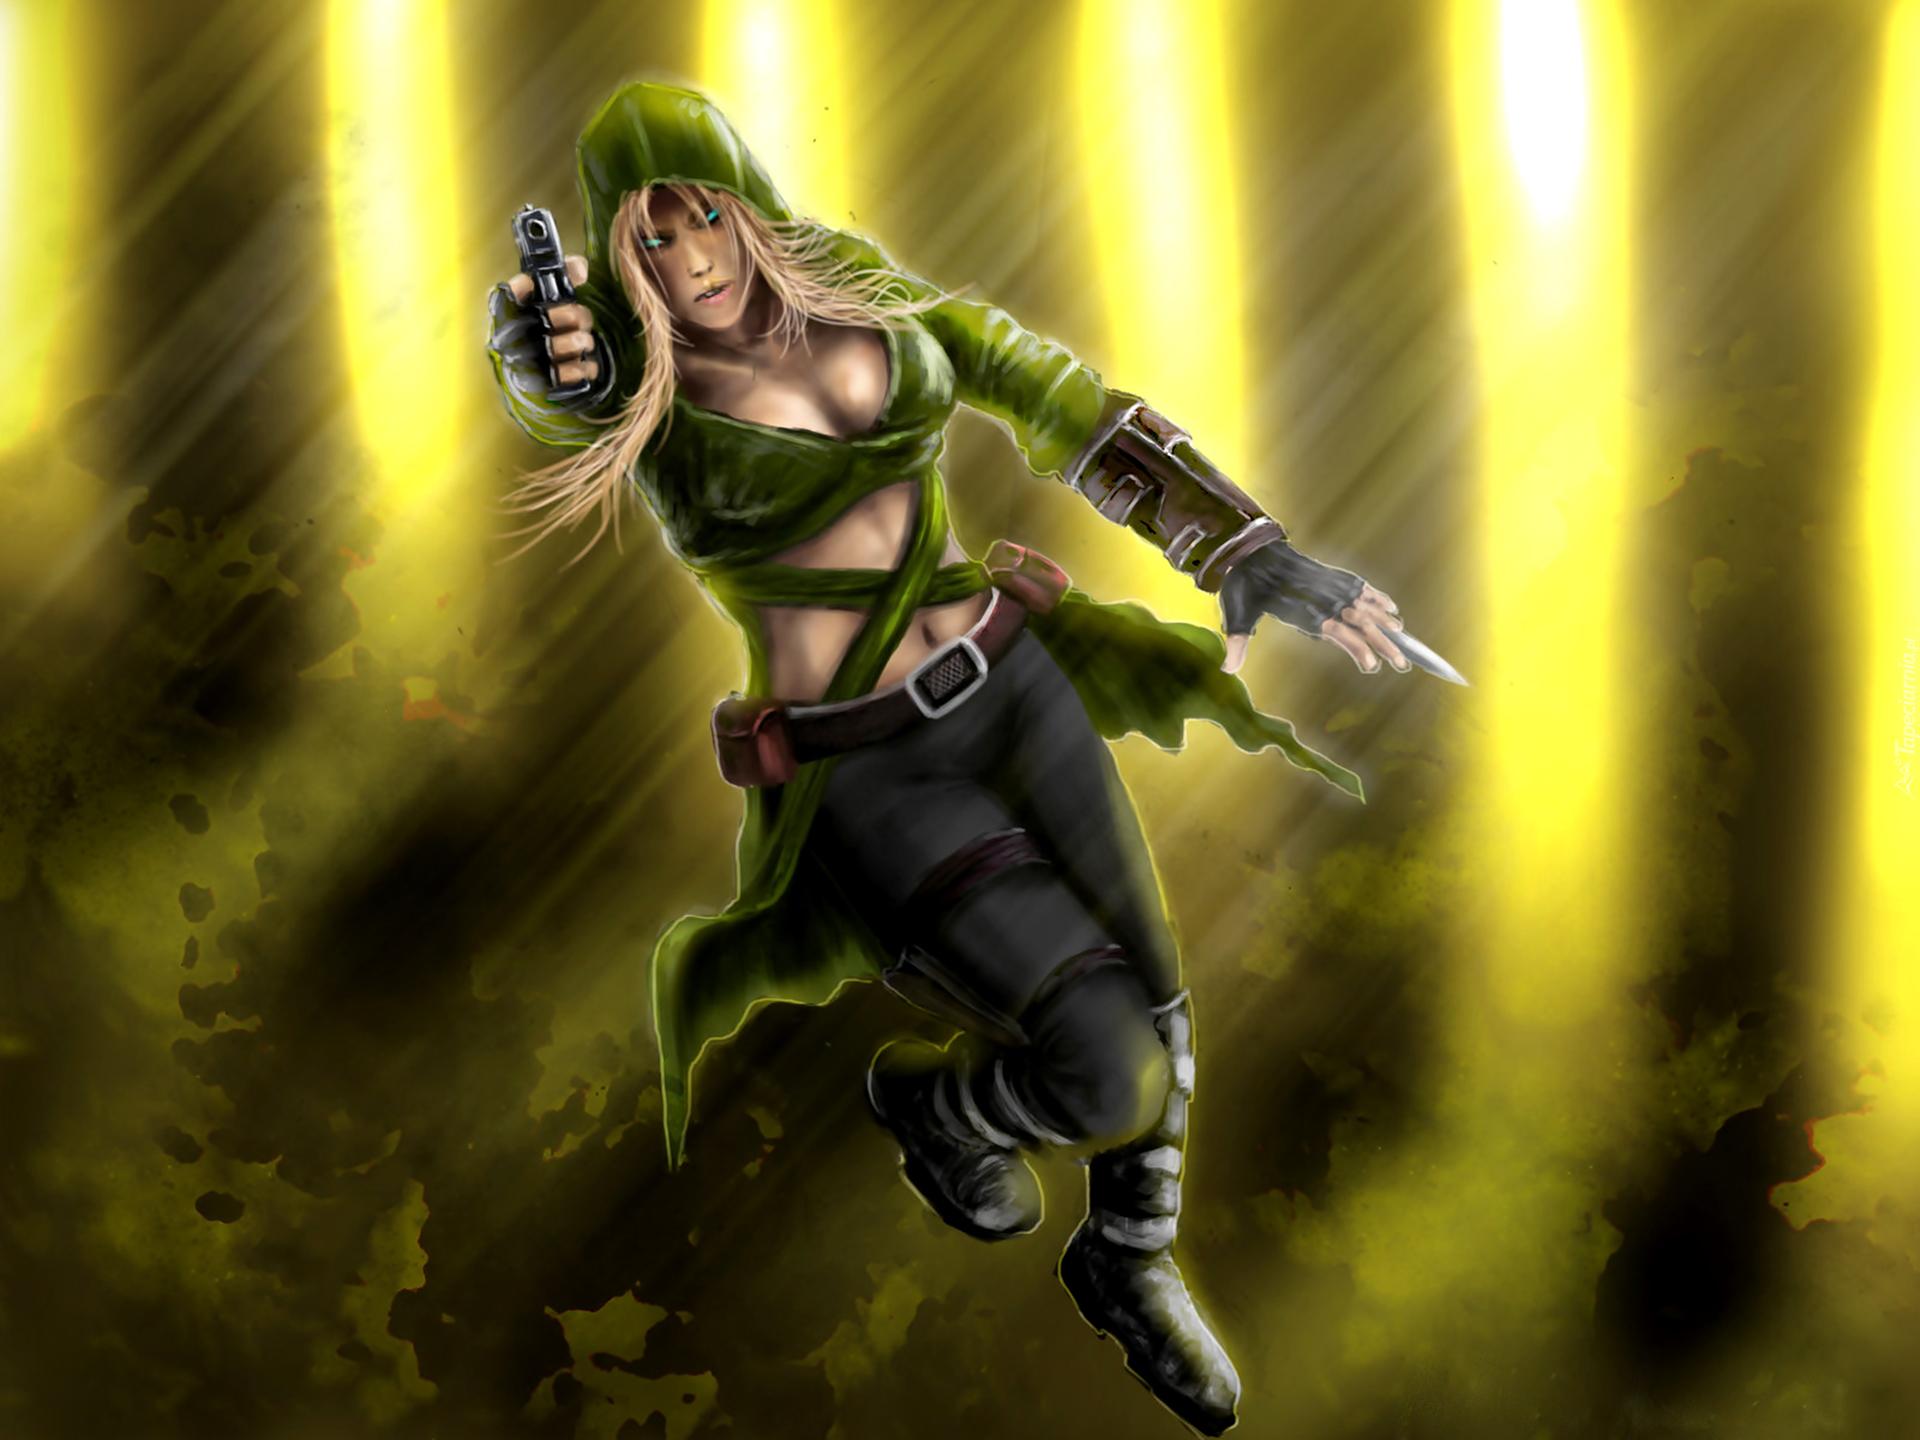 Mortal Kombat, Sonya Blade - 1073.2KB